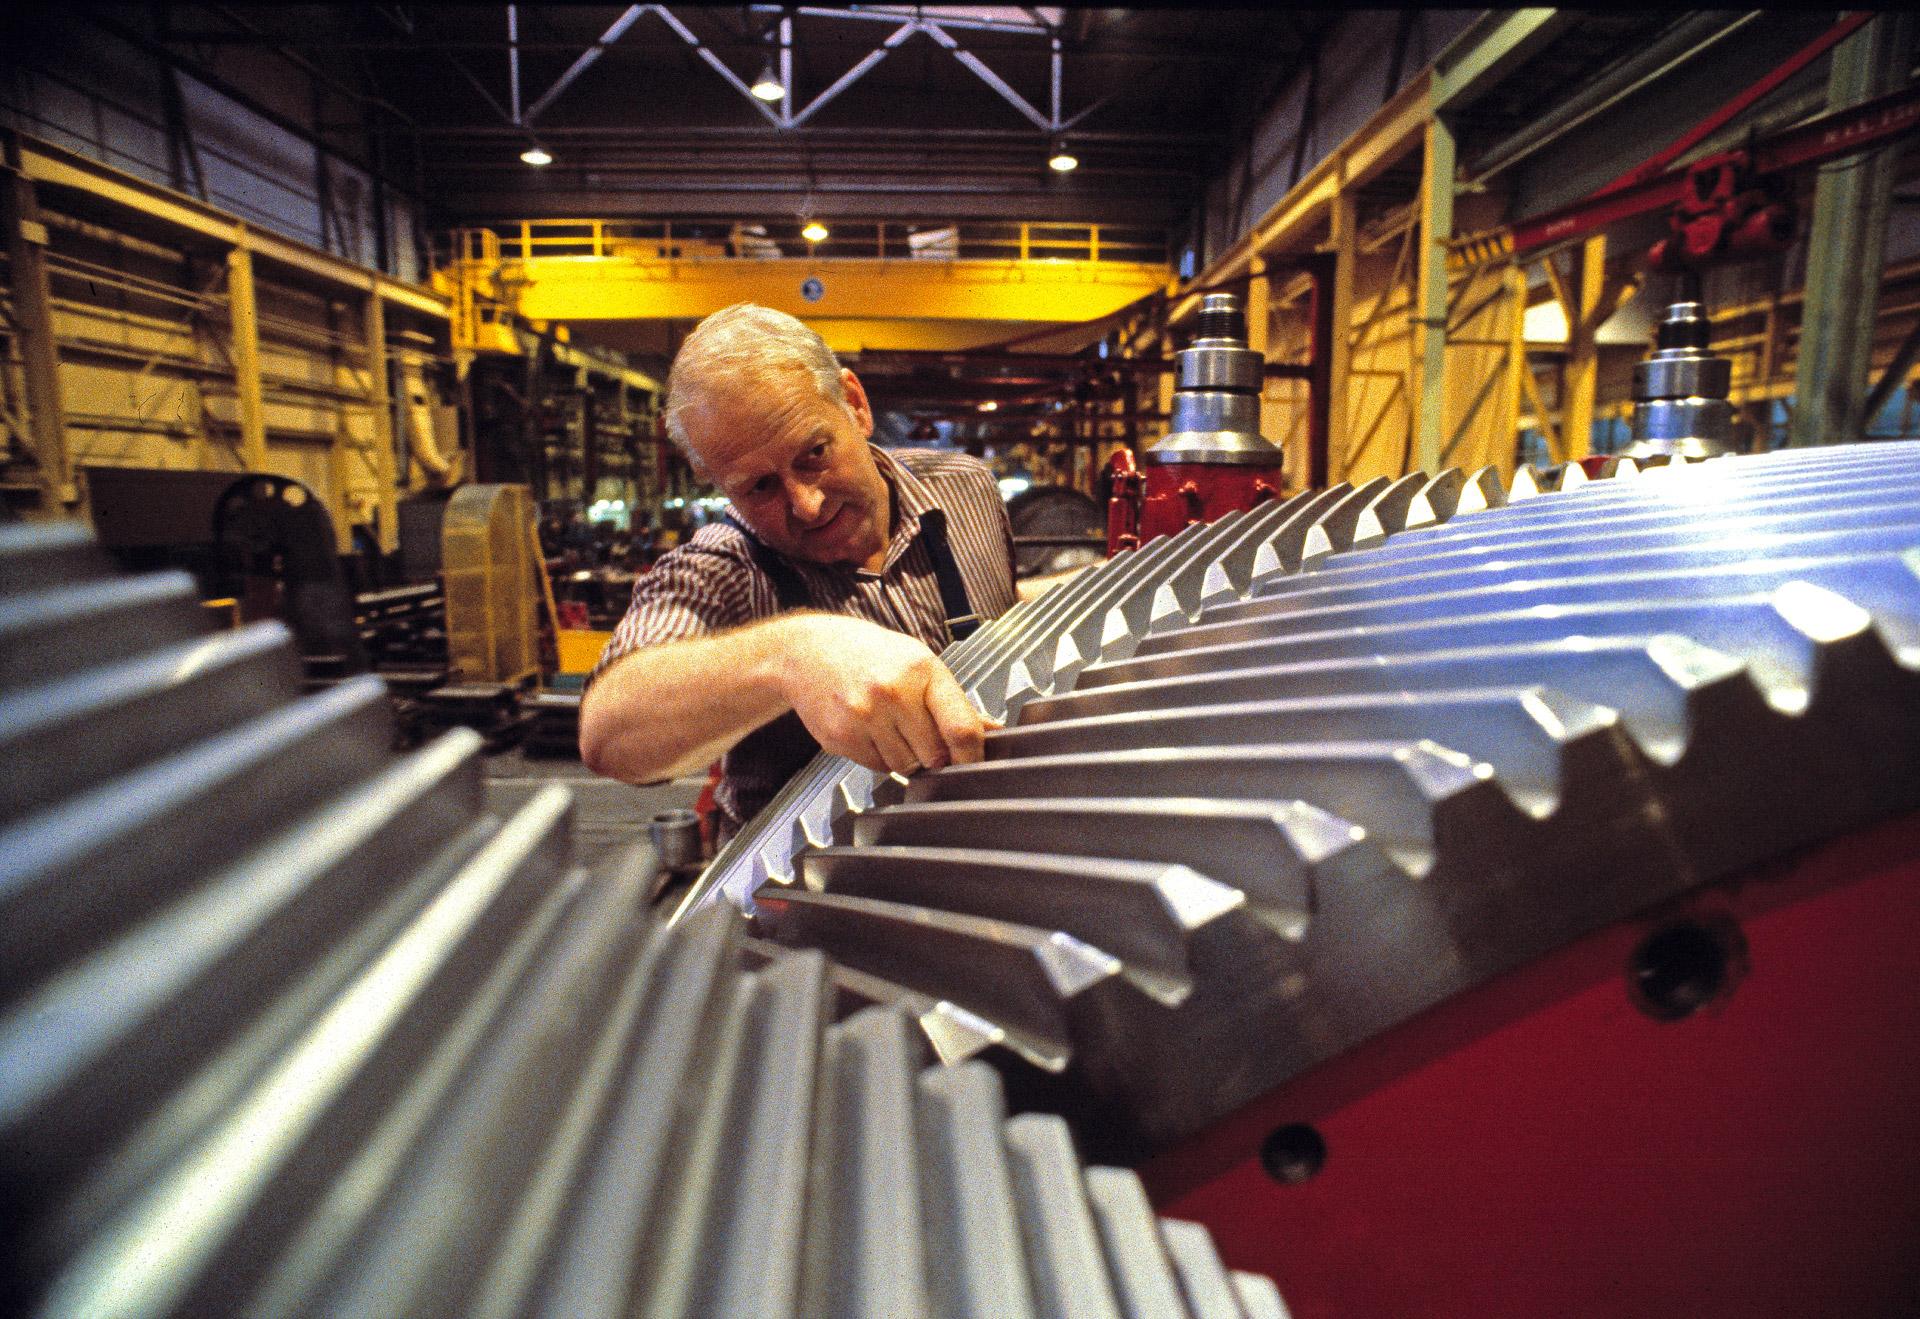 An employee checks the gear at FLS Industries in Copenhagen, Denmark